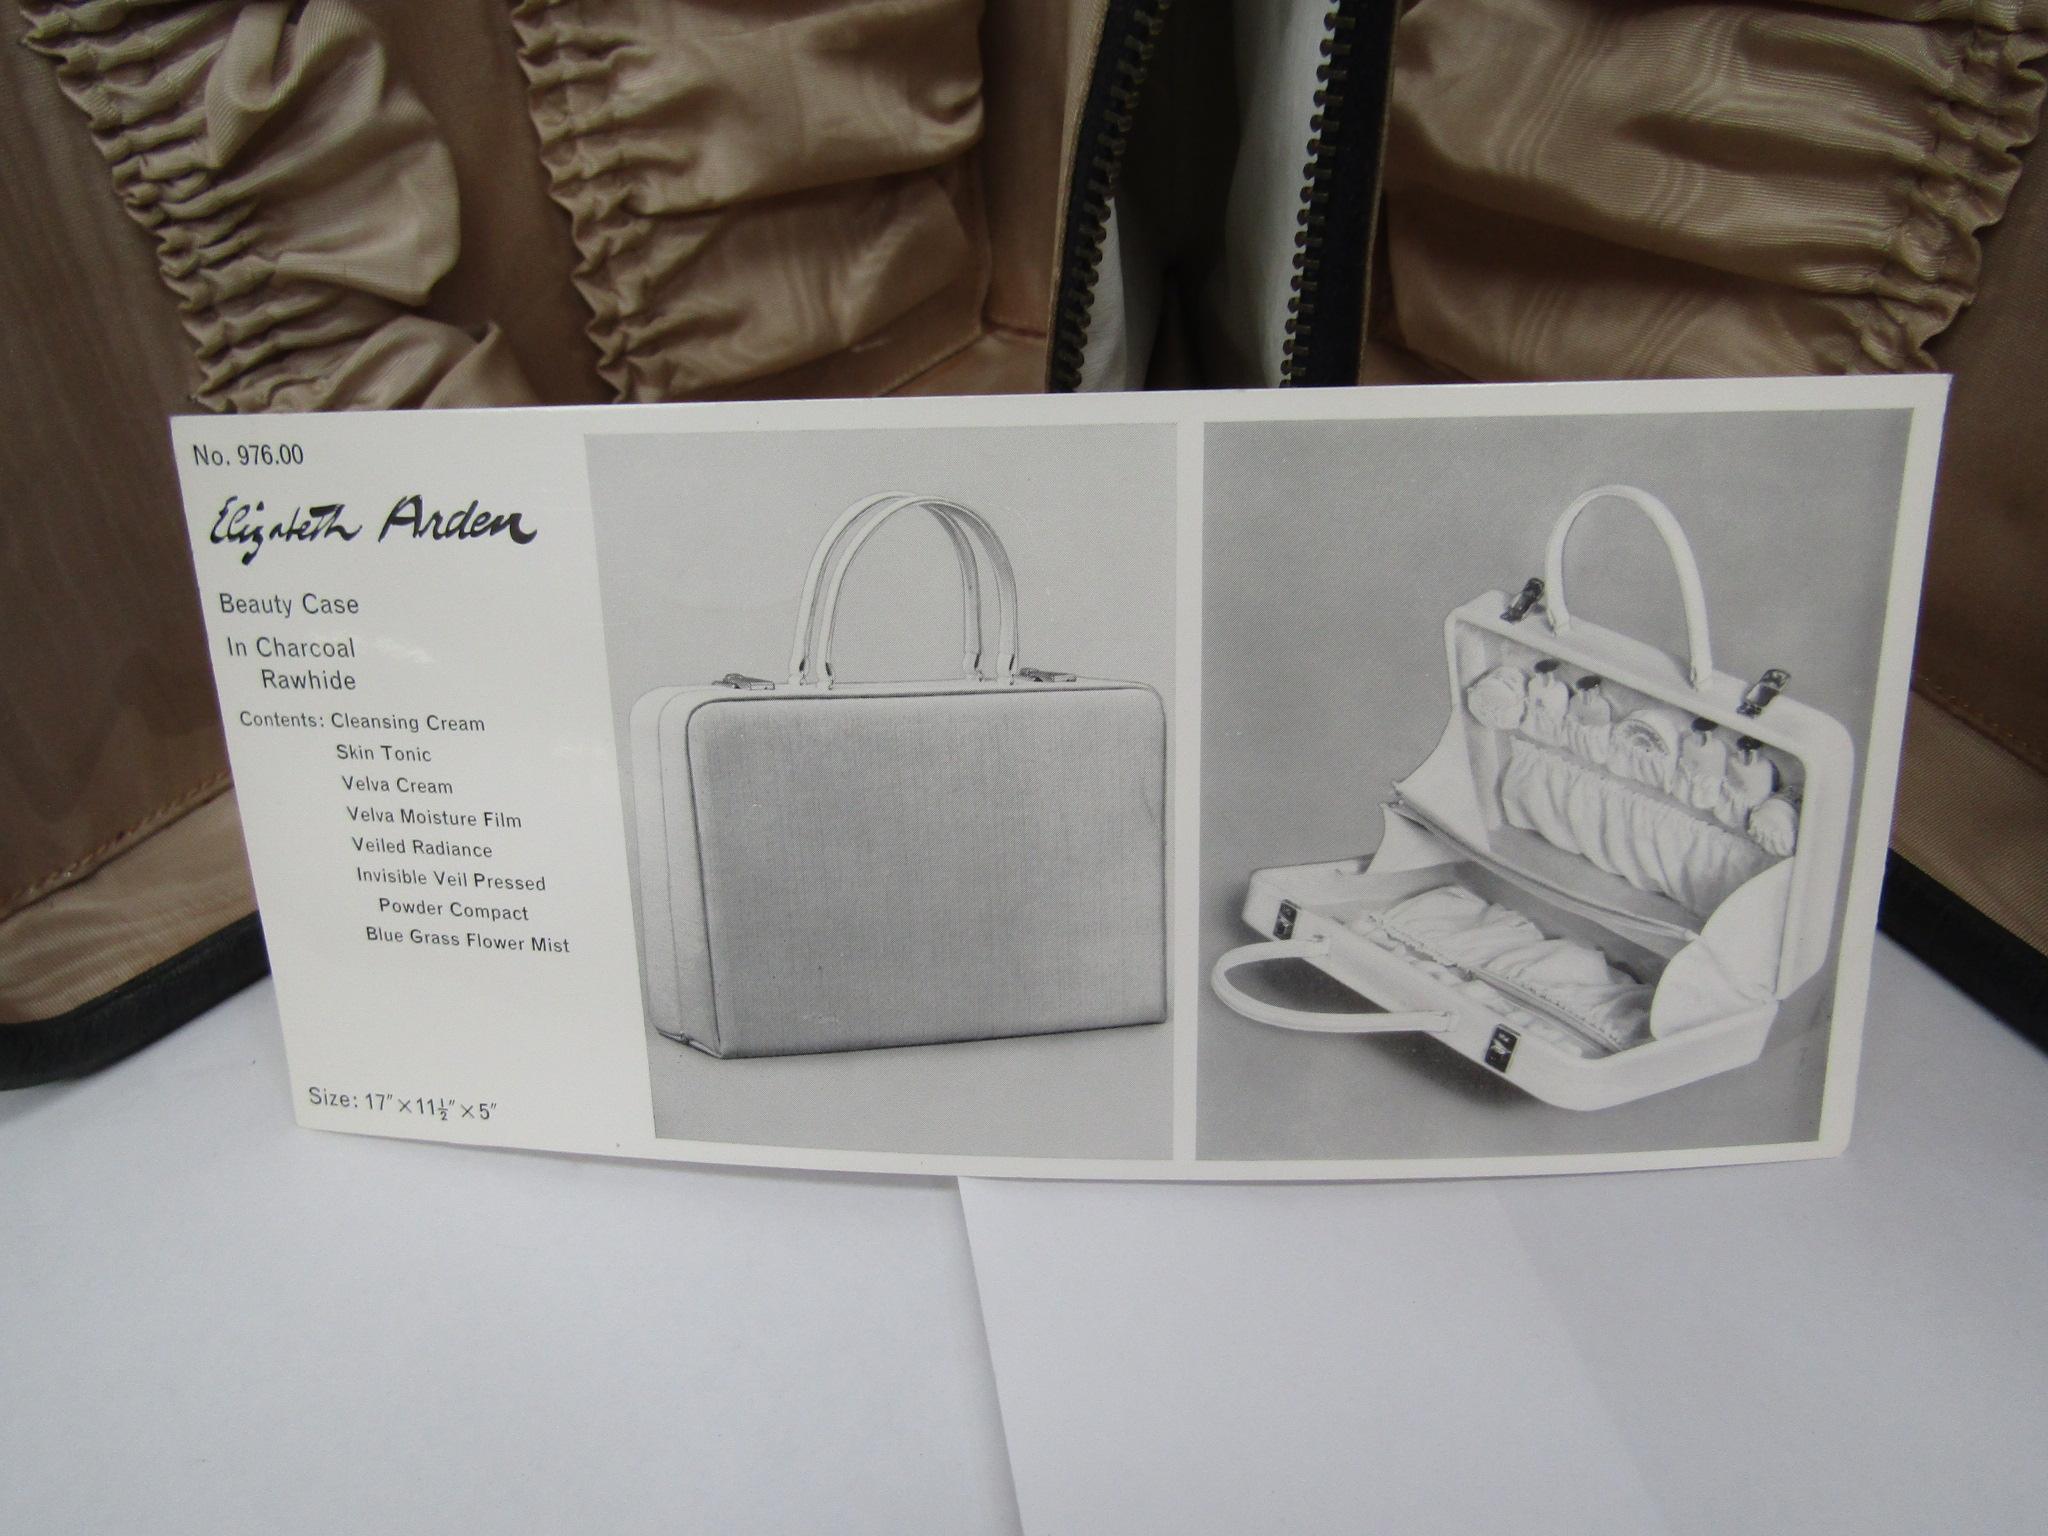 Elizabeth Arden beauty/vanity case in charcoal, beige ruched interior, - Image 3 of 3